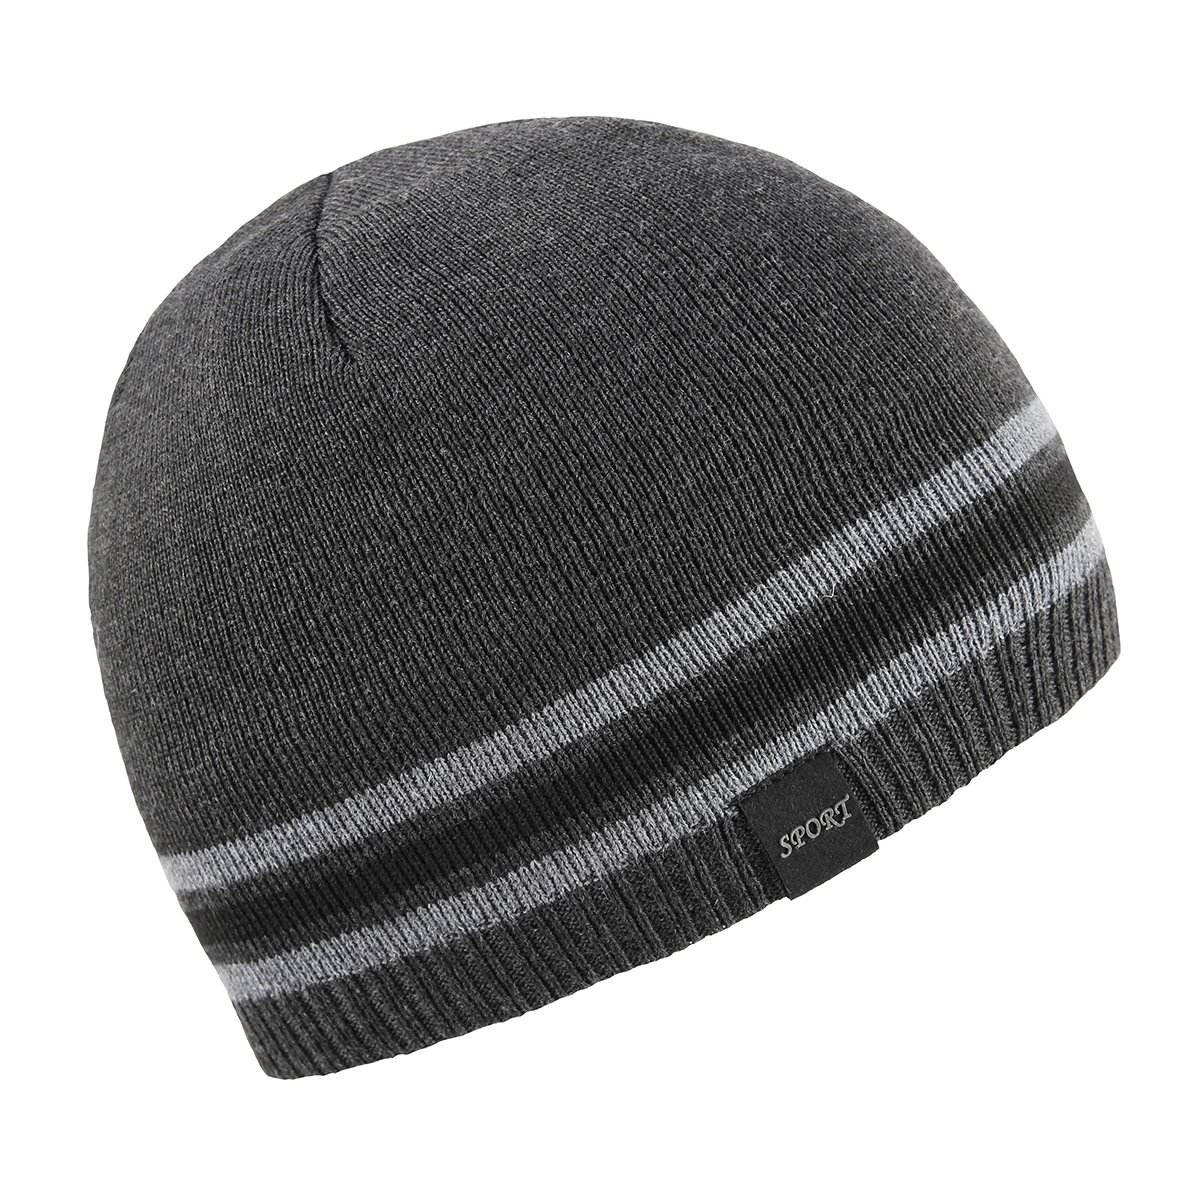 cde865a34c5 OMECHY Mens Winter Beanie Hat Warm Cuff Toboggan Knit Ski Skull Cap ...